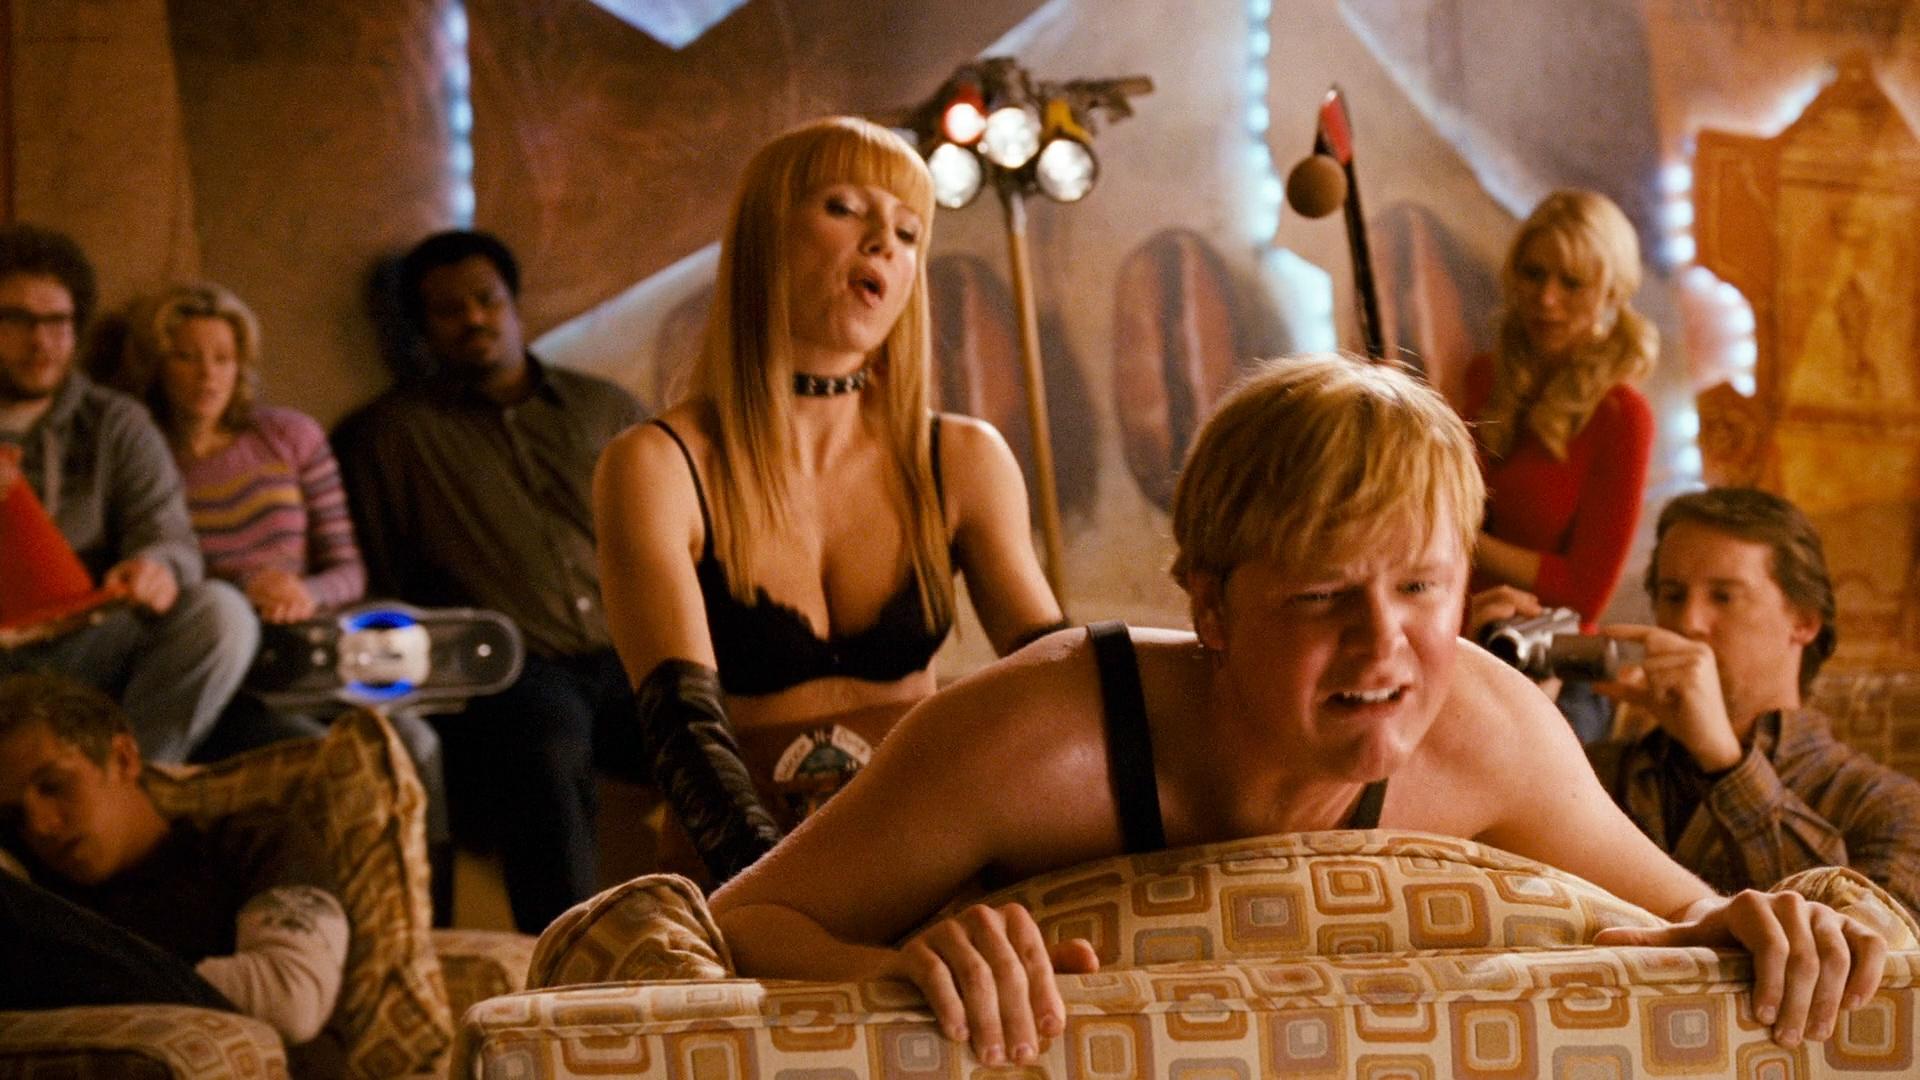 Elizabeth Banks hot Katie Morgan nude others nude too - Zack and Miri Make A Porno (2008) hd1080p BluRay (16)